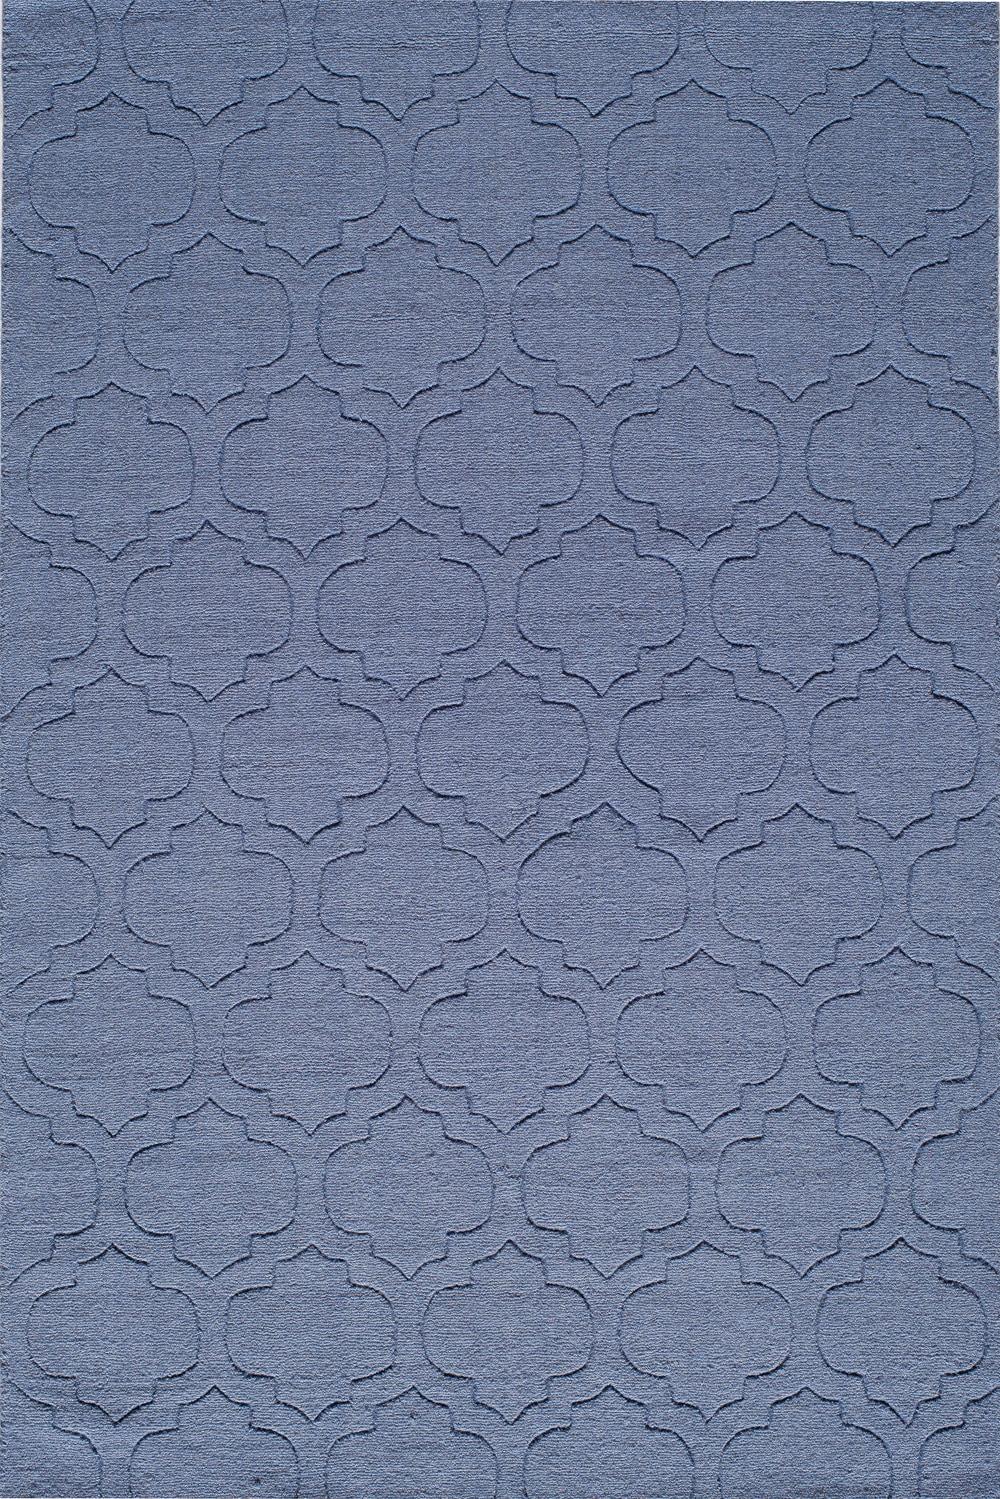 Rugs - Spectra Blue Furniture Express 5 x 8 Rug